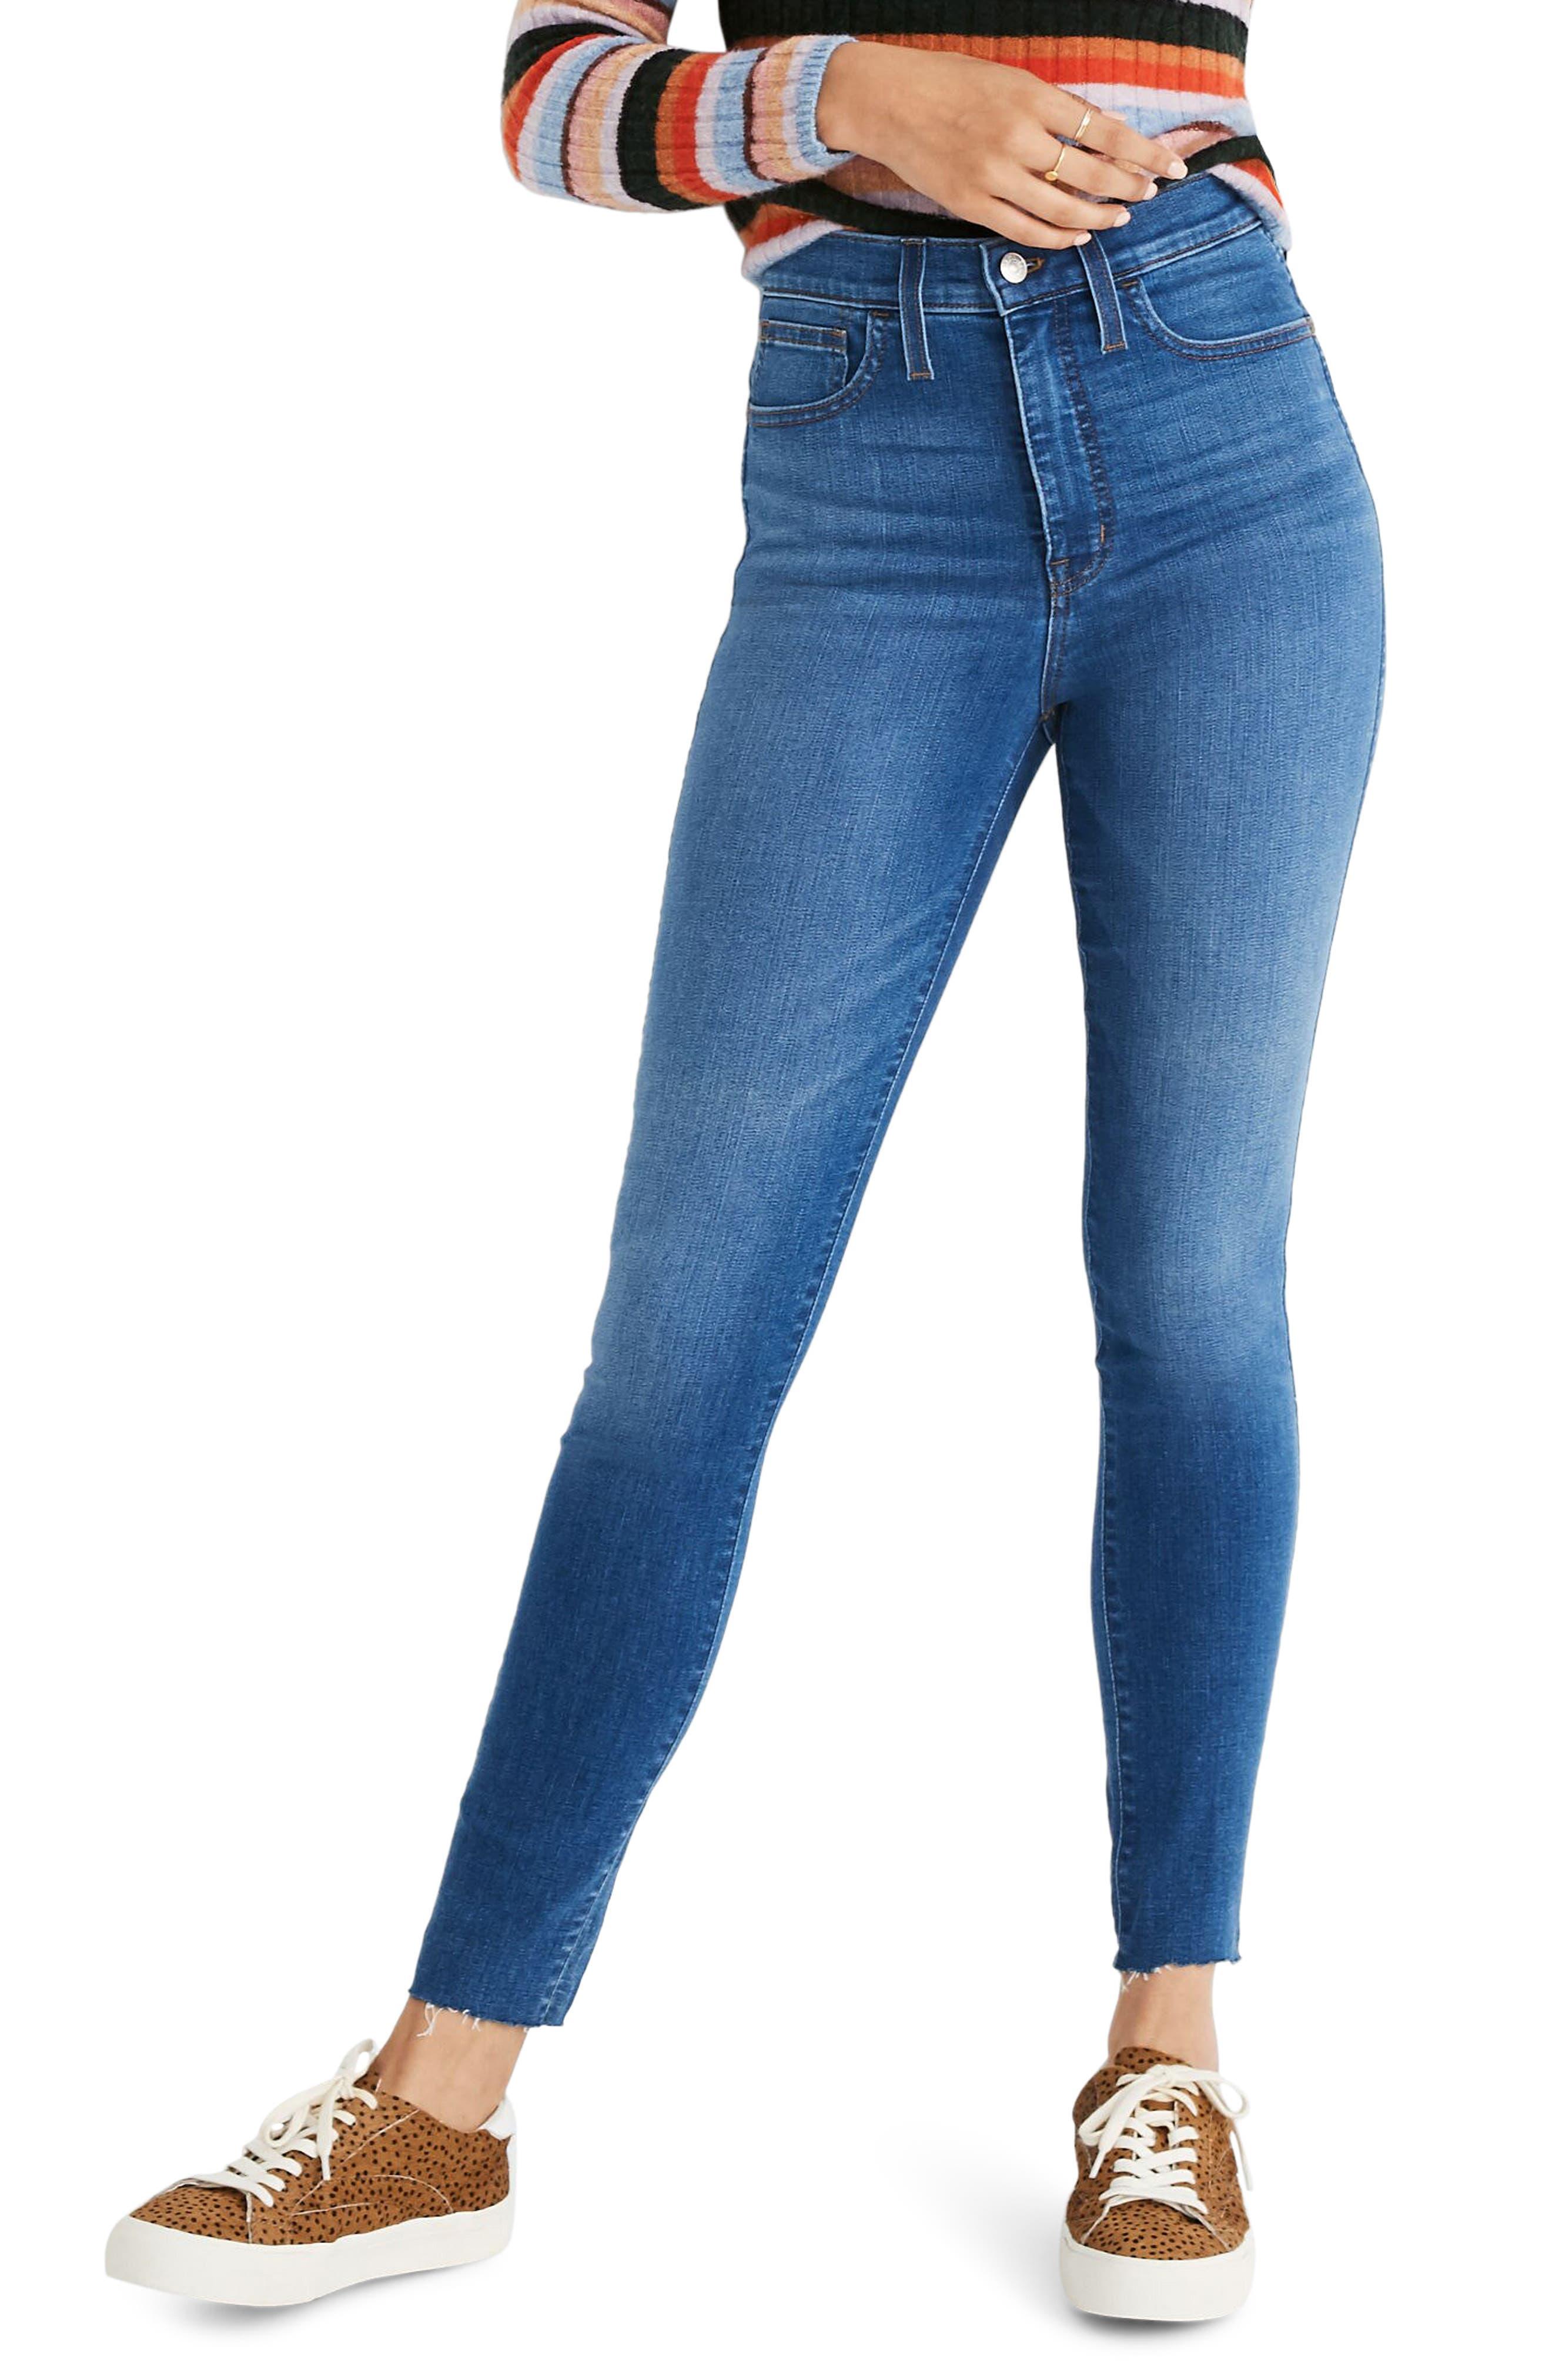 Madewell Roadtripper High Rise Jeans (Regular & Plus Size)